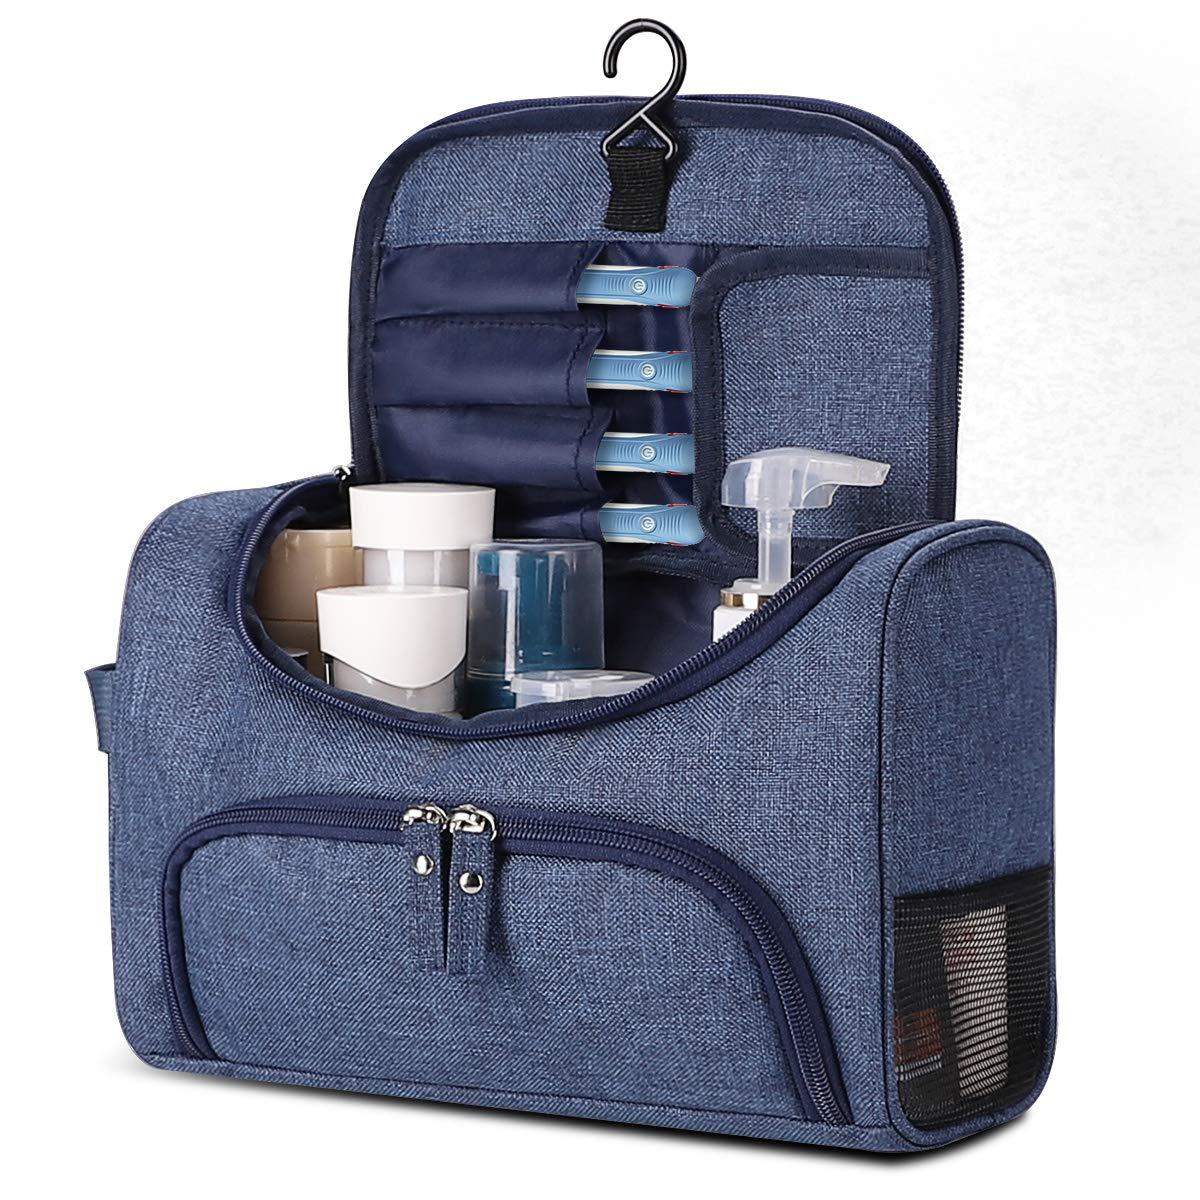 3c036e13b64 Details about Travel Toiletry Bag, KUSOOFA Toiletry Wash Bag, Hanging  Shower Bag, Shaving Bag